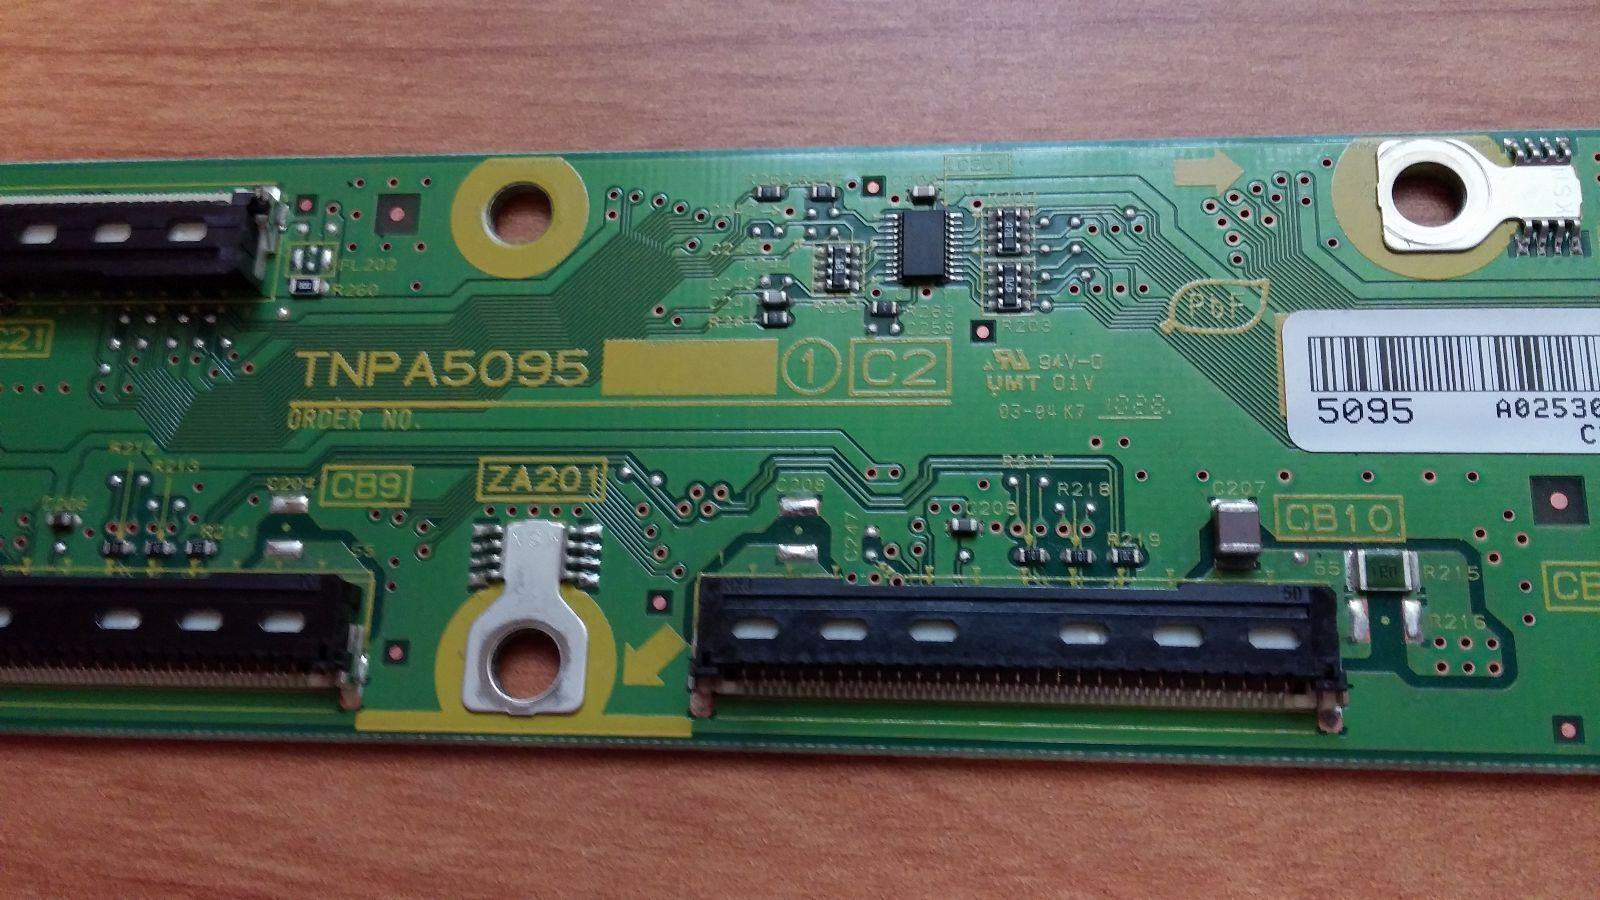 Panasonic TXNC21LHUU (TNPA5095, TXNC211NEK42) C2 Board **FREE SHIPPING**